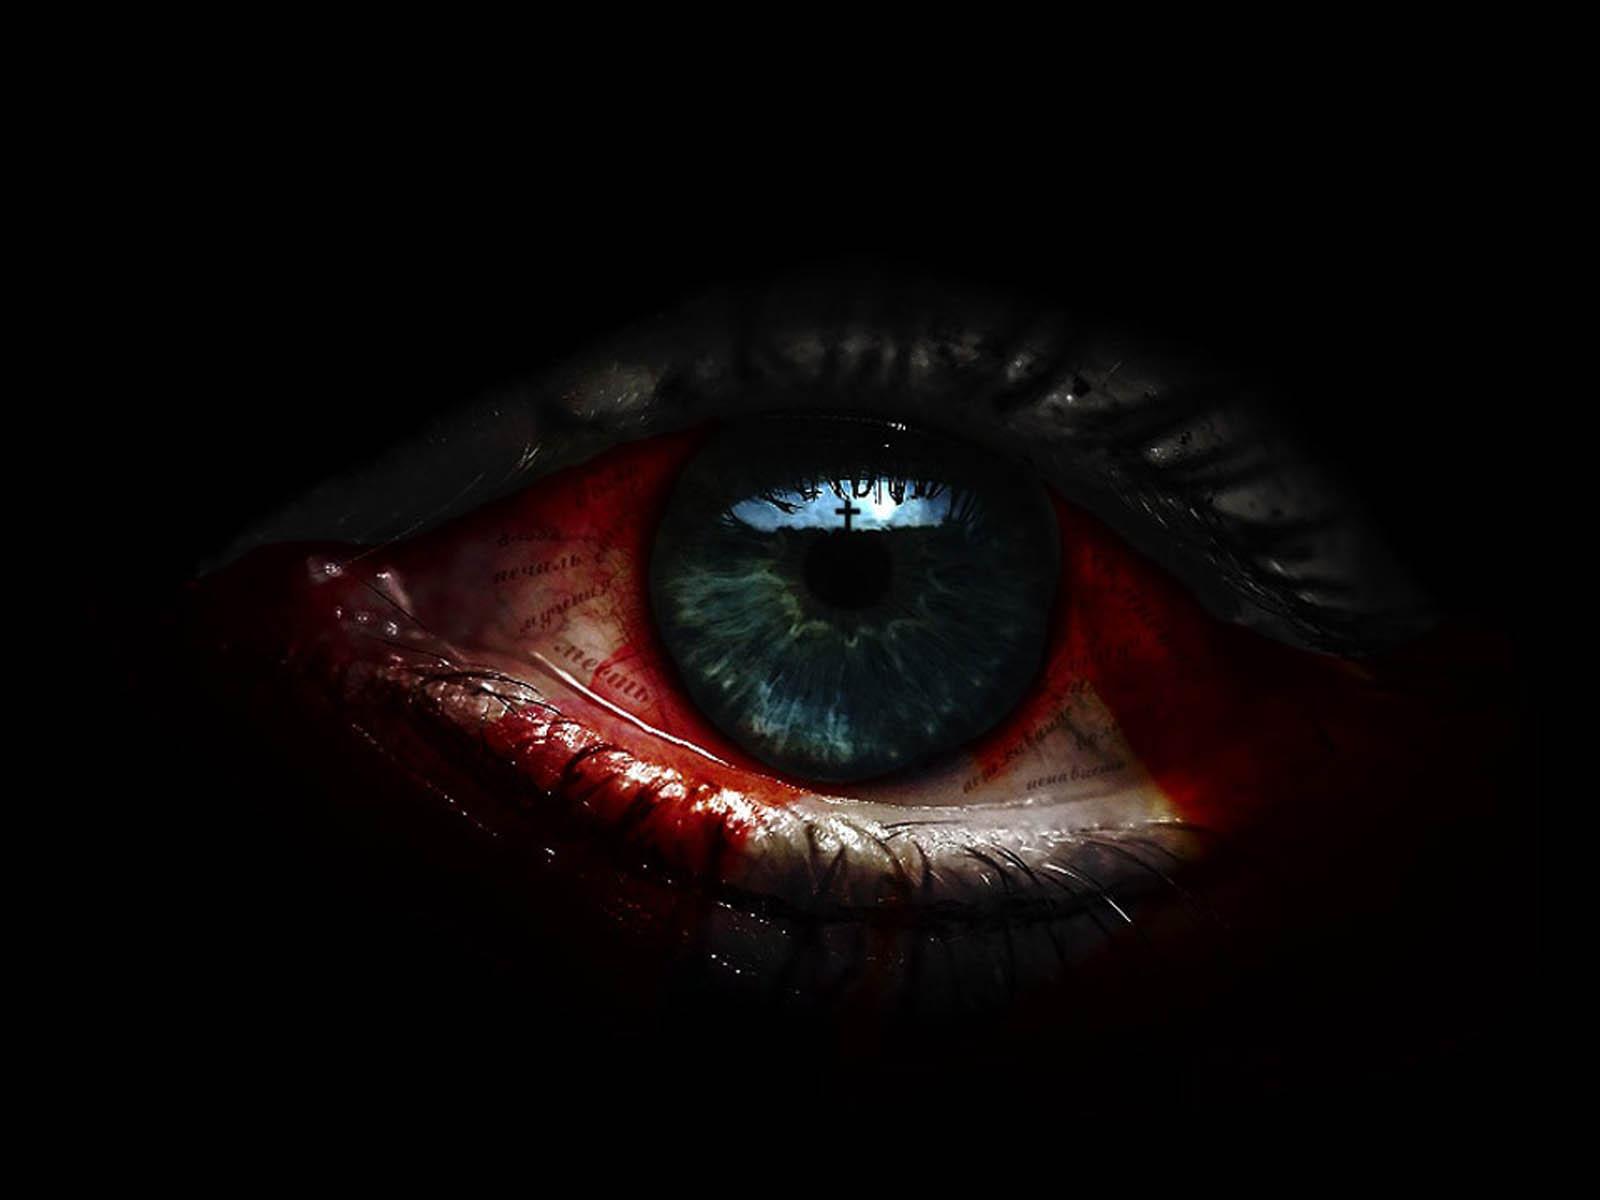 horror eye wallpaper hd - photo #2